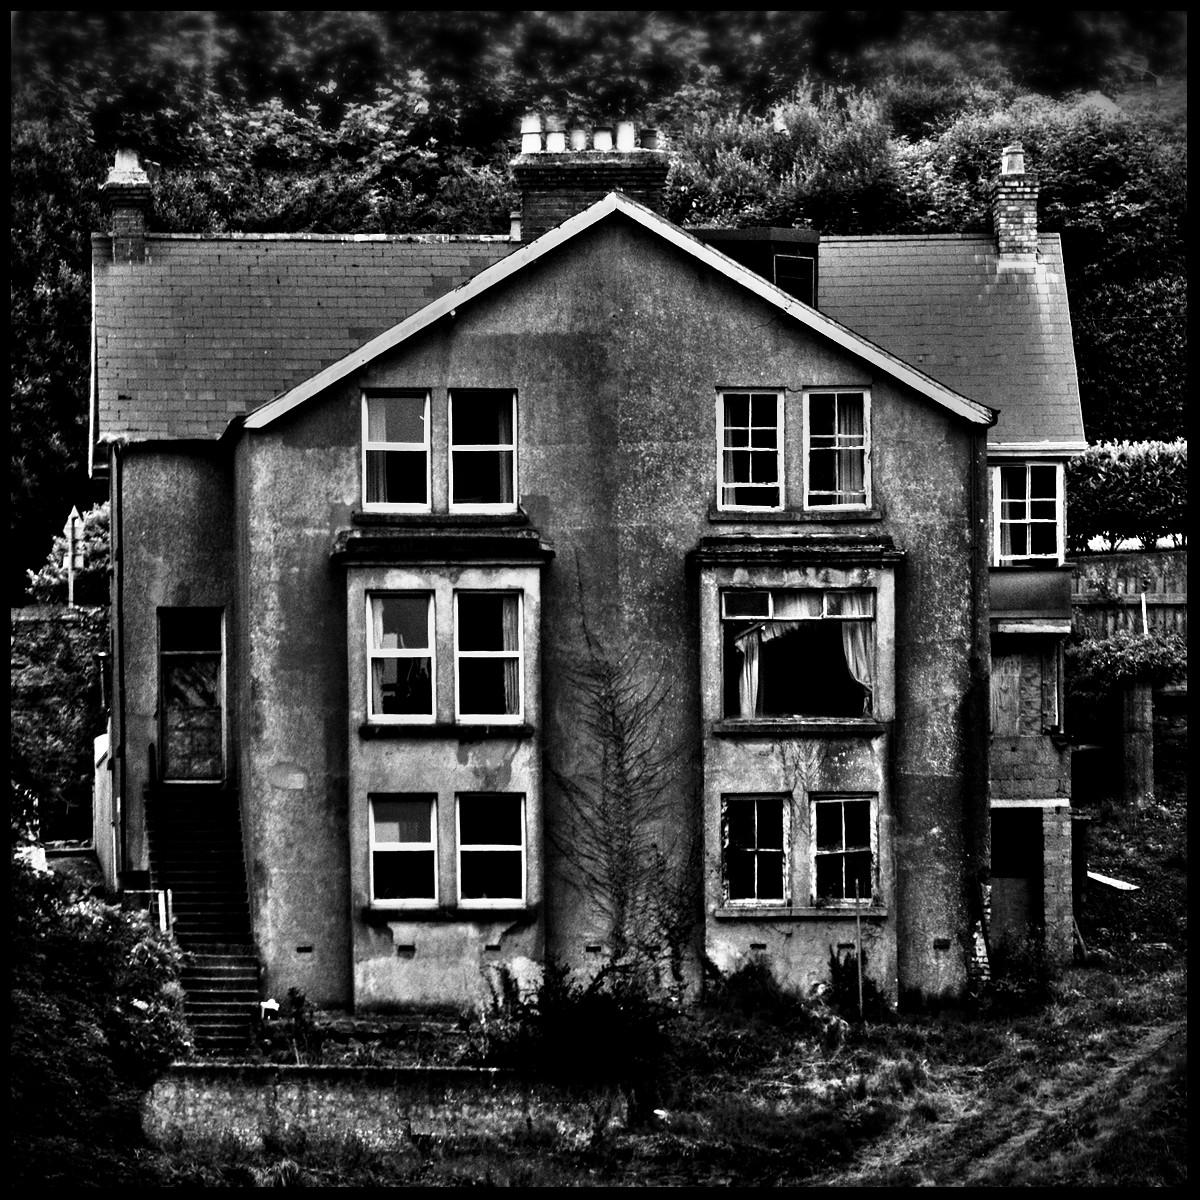 MONO - Bleak House - Charles Dickens by Alan Kearney  (8 marks)